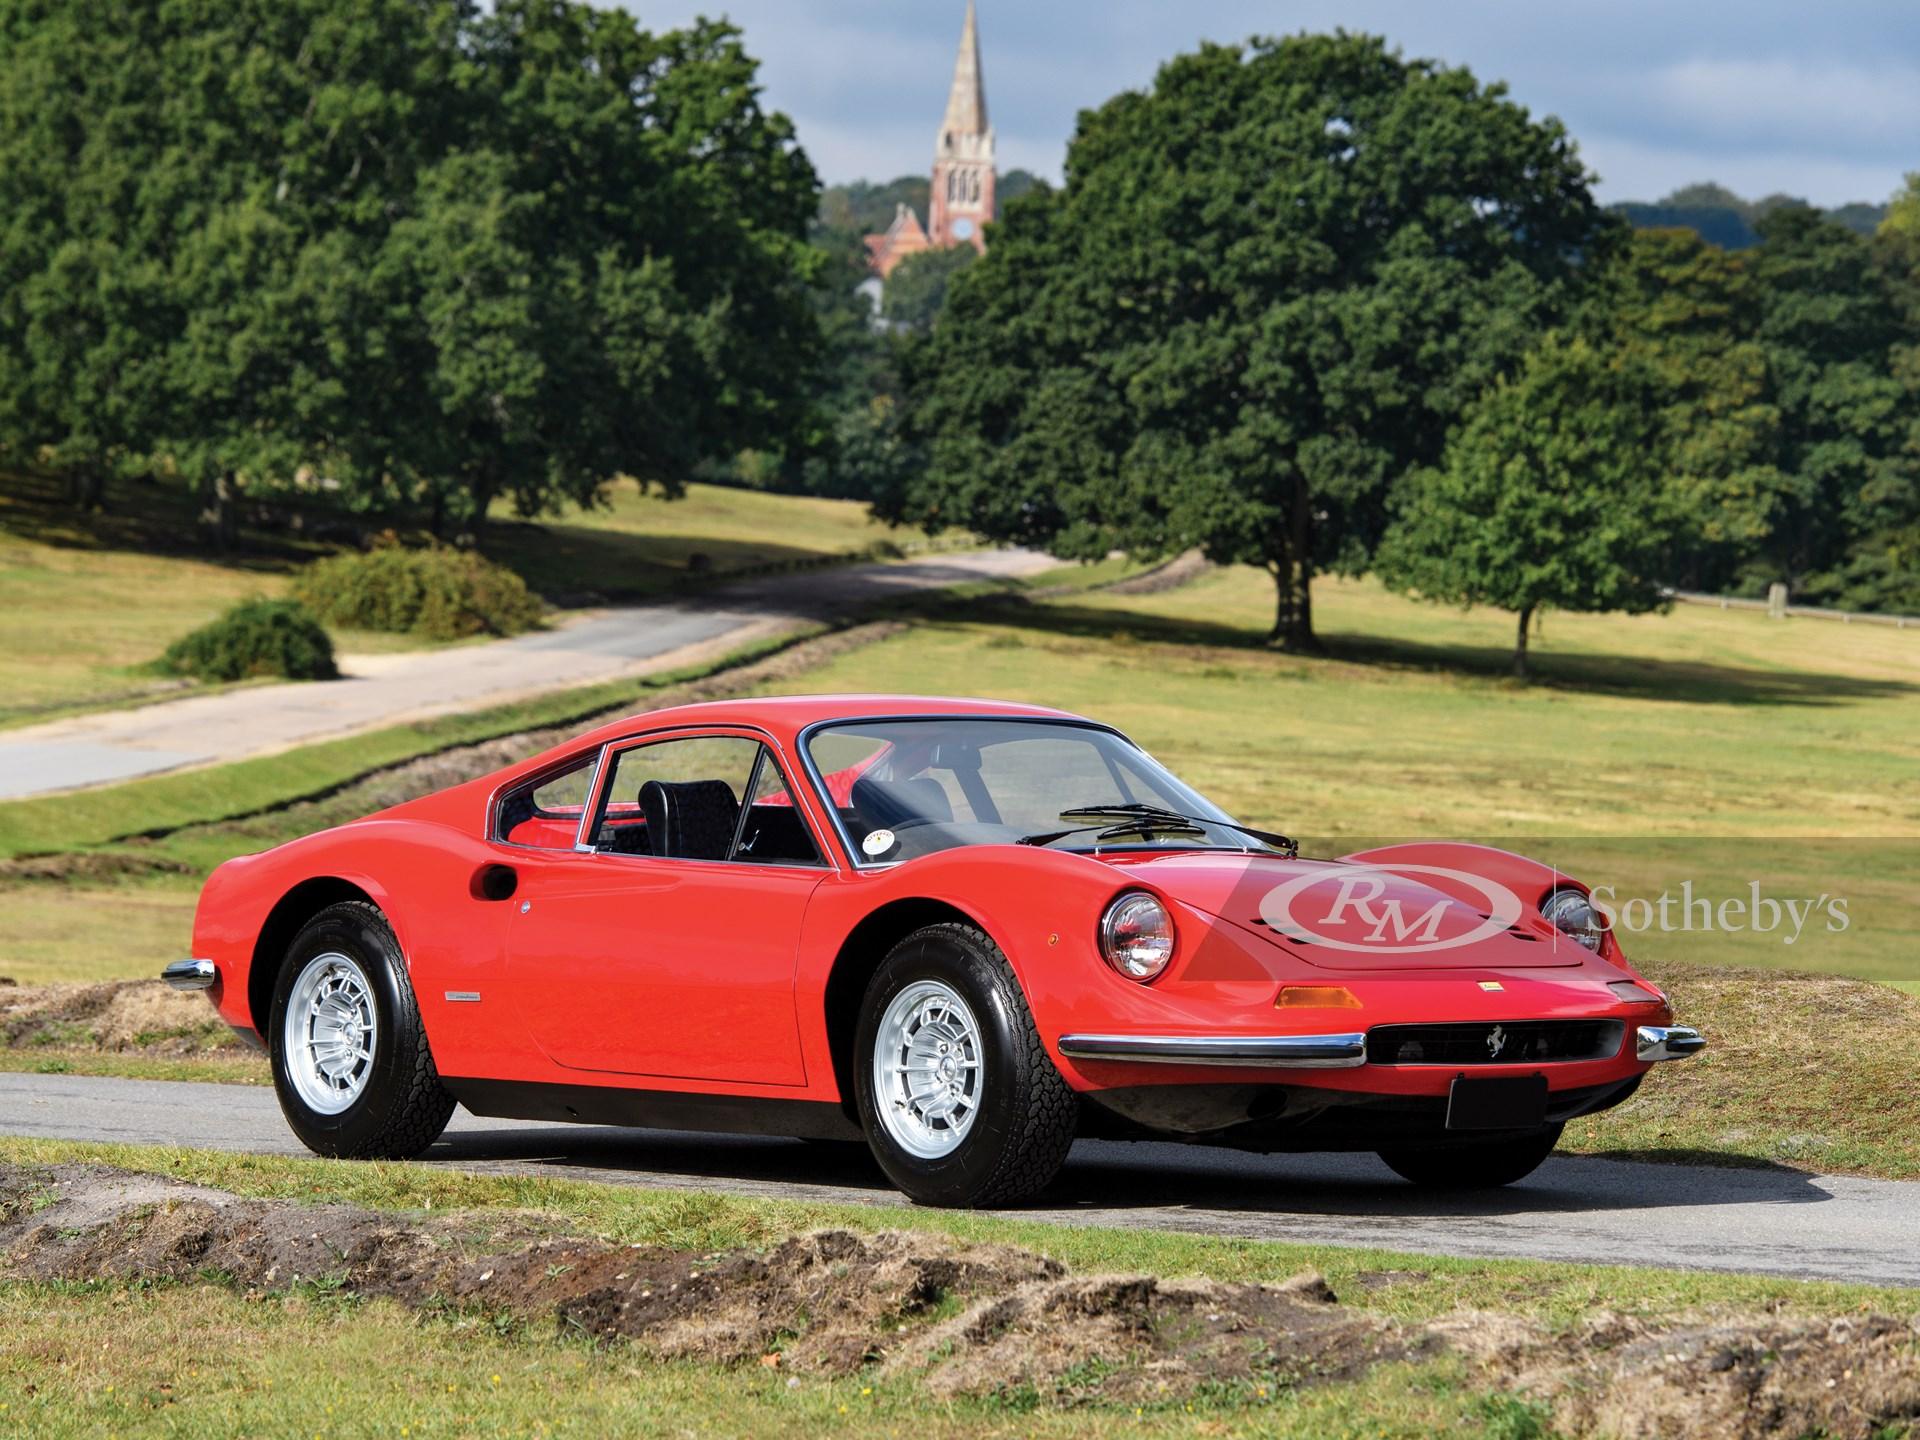 1973 Ferrari Dino 246 Gt By Scaglietti London 2019 Rm Sotheby S